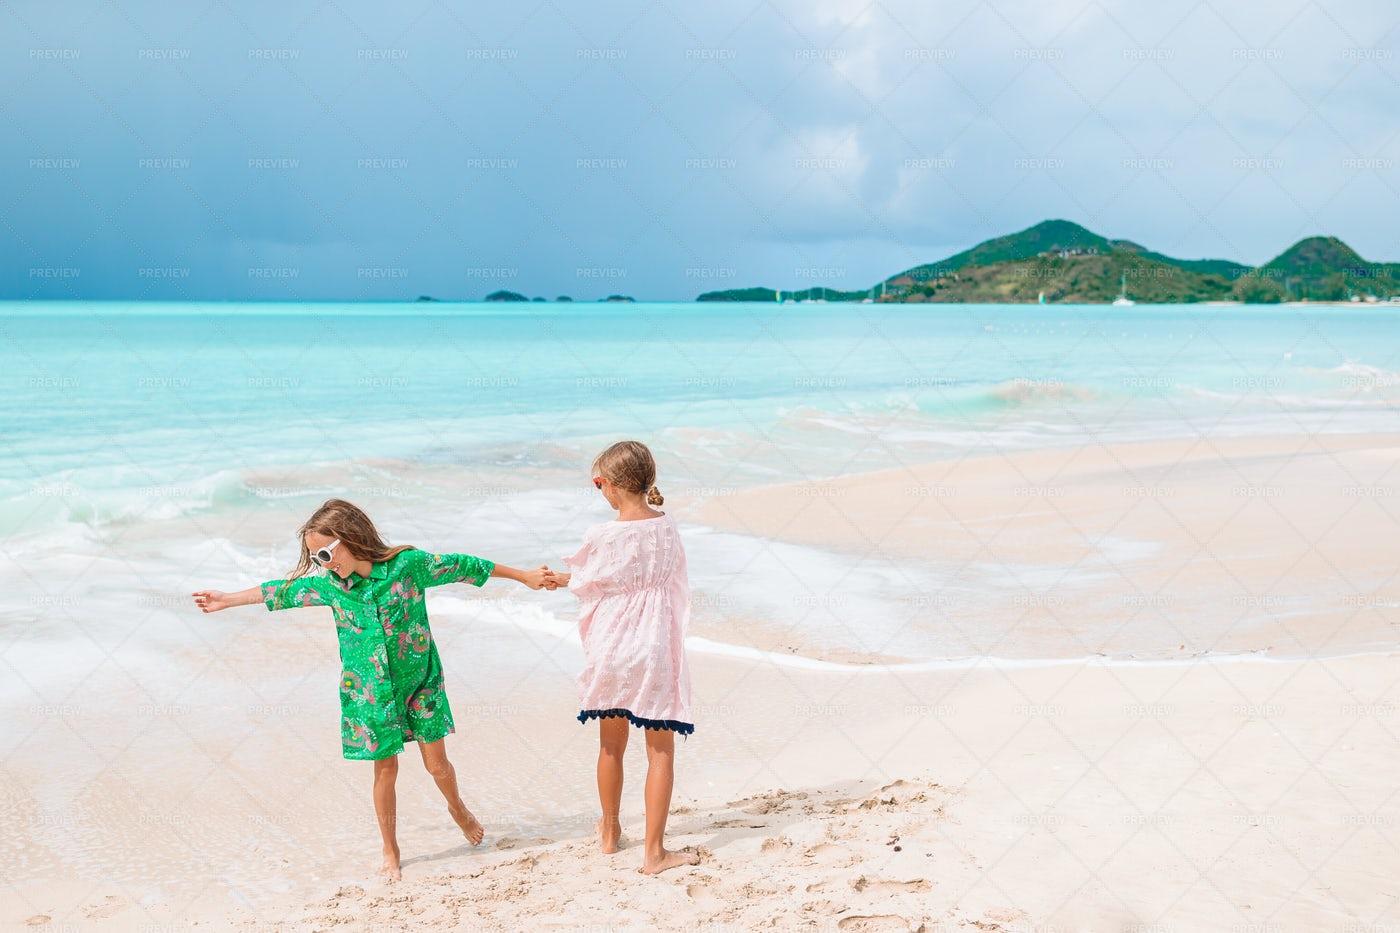 Girls Playing Around On A Beach: Stock Photos